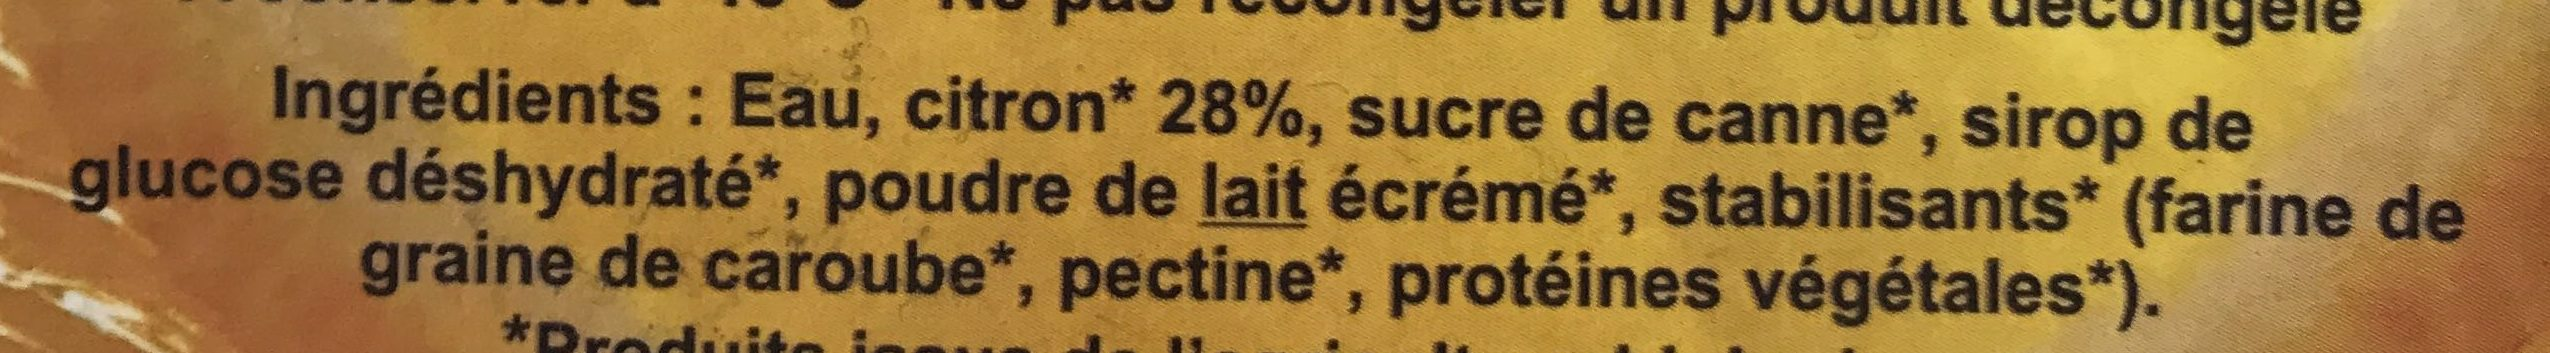 Citron bio - Ingredients